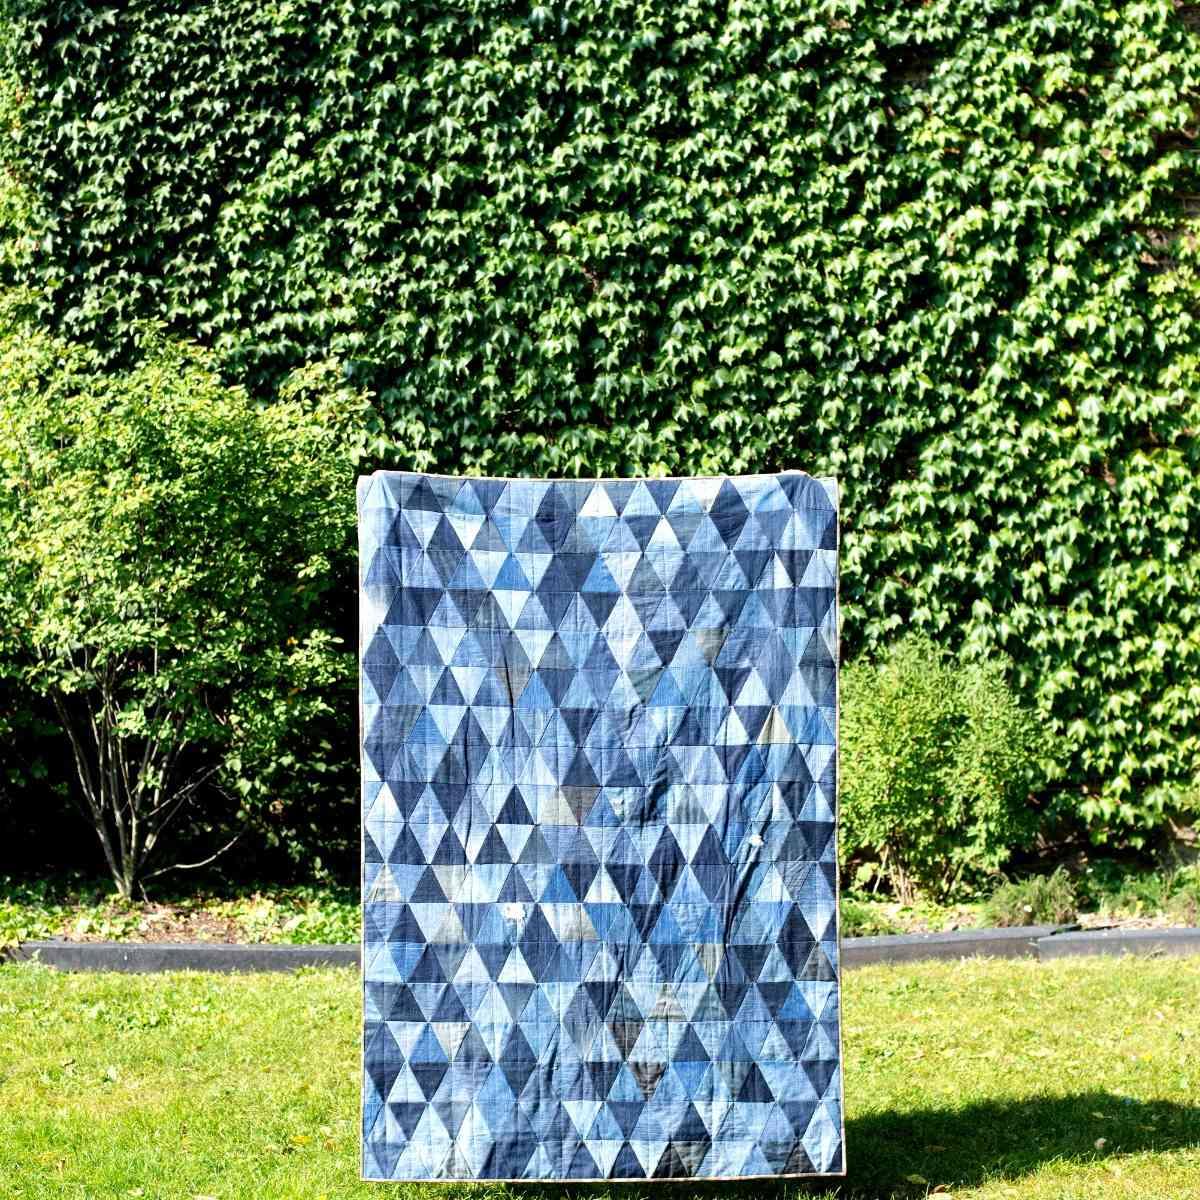 A blue denim quilt in a green yard